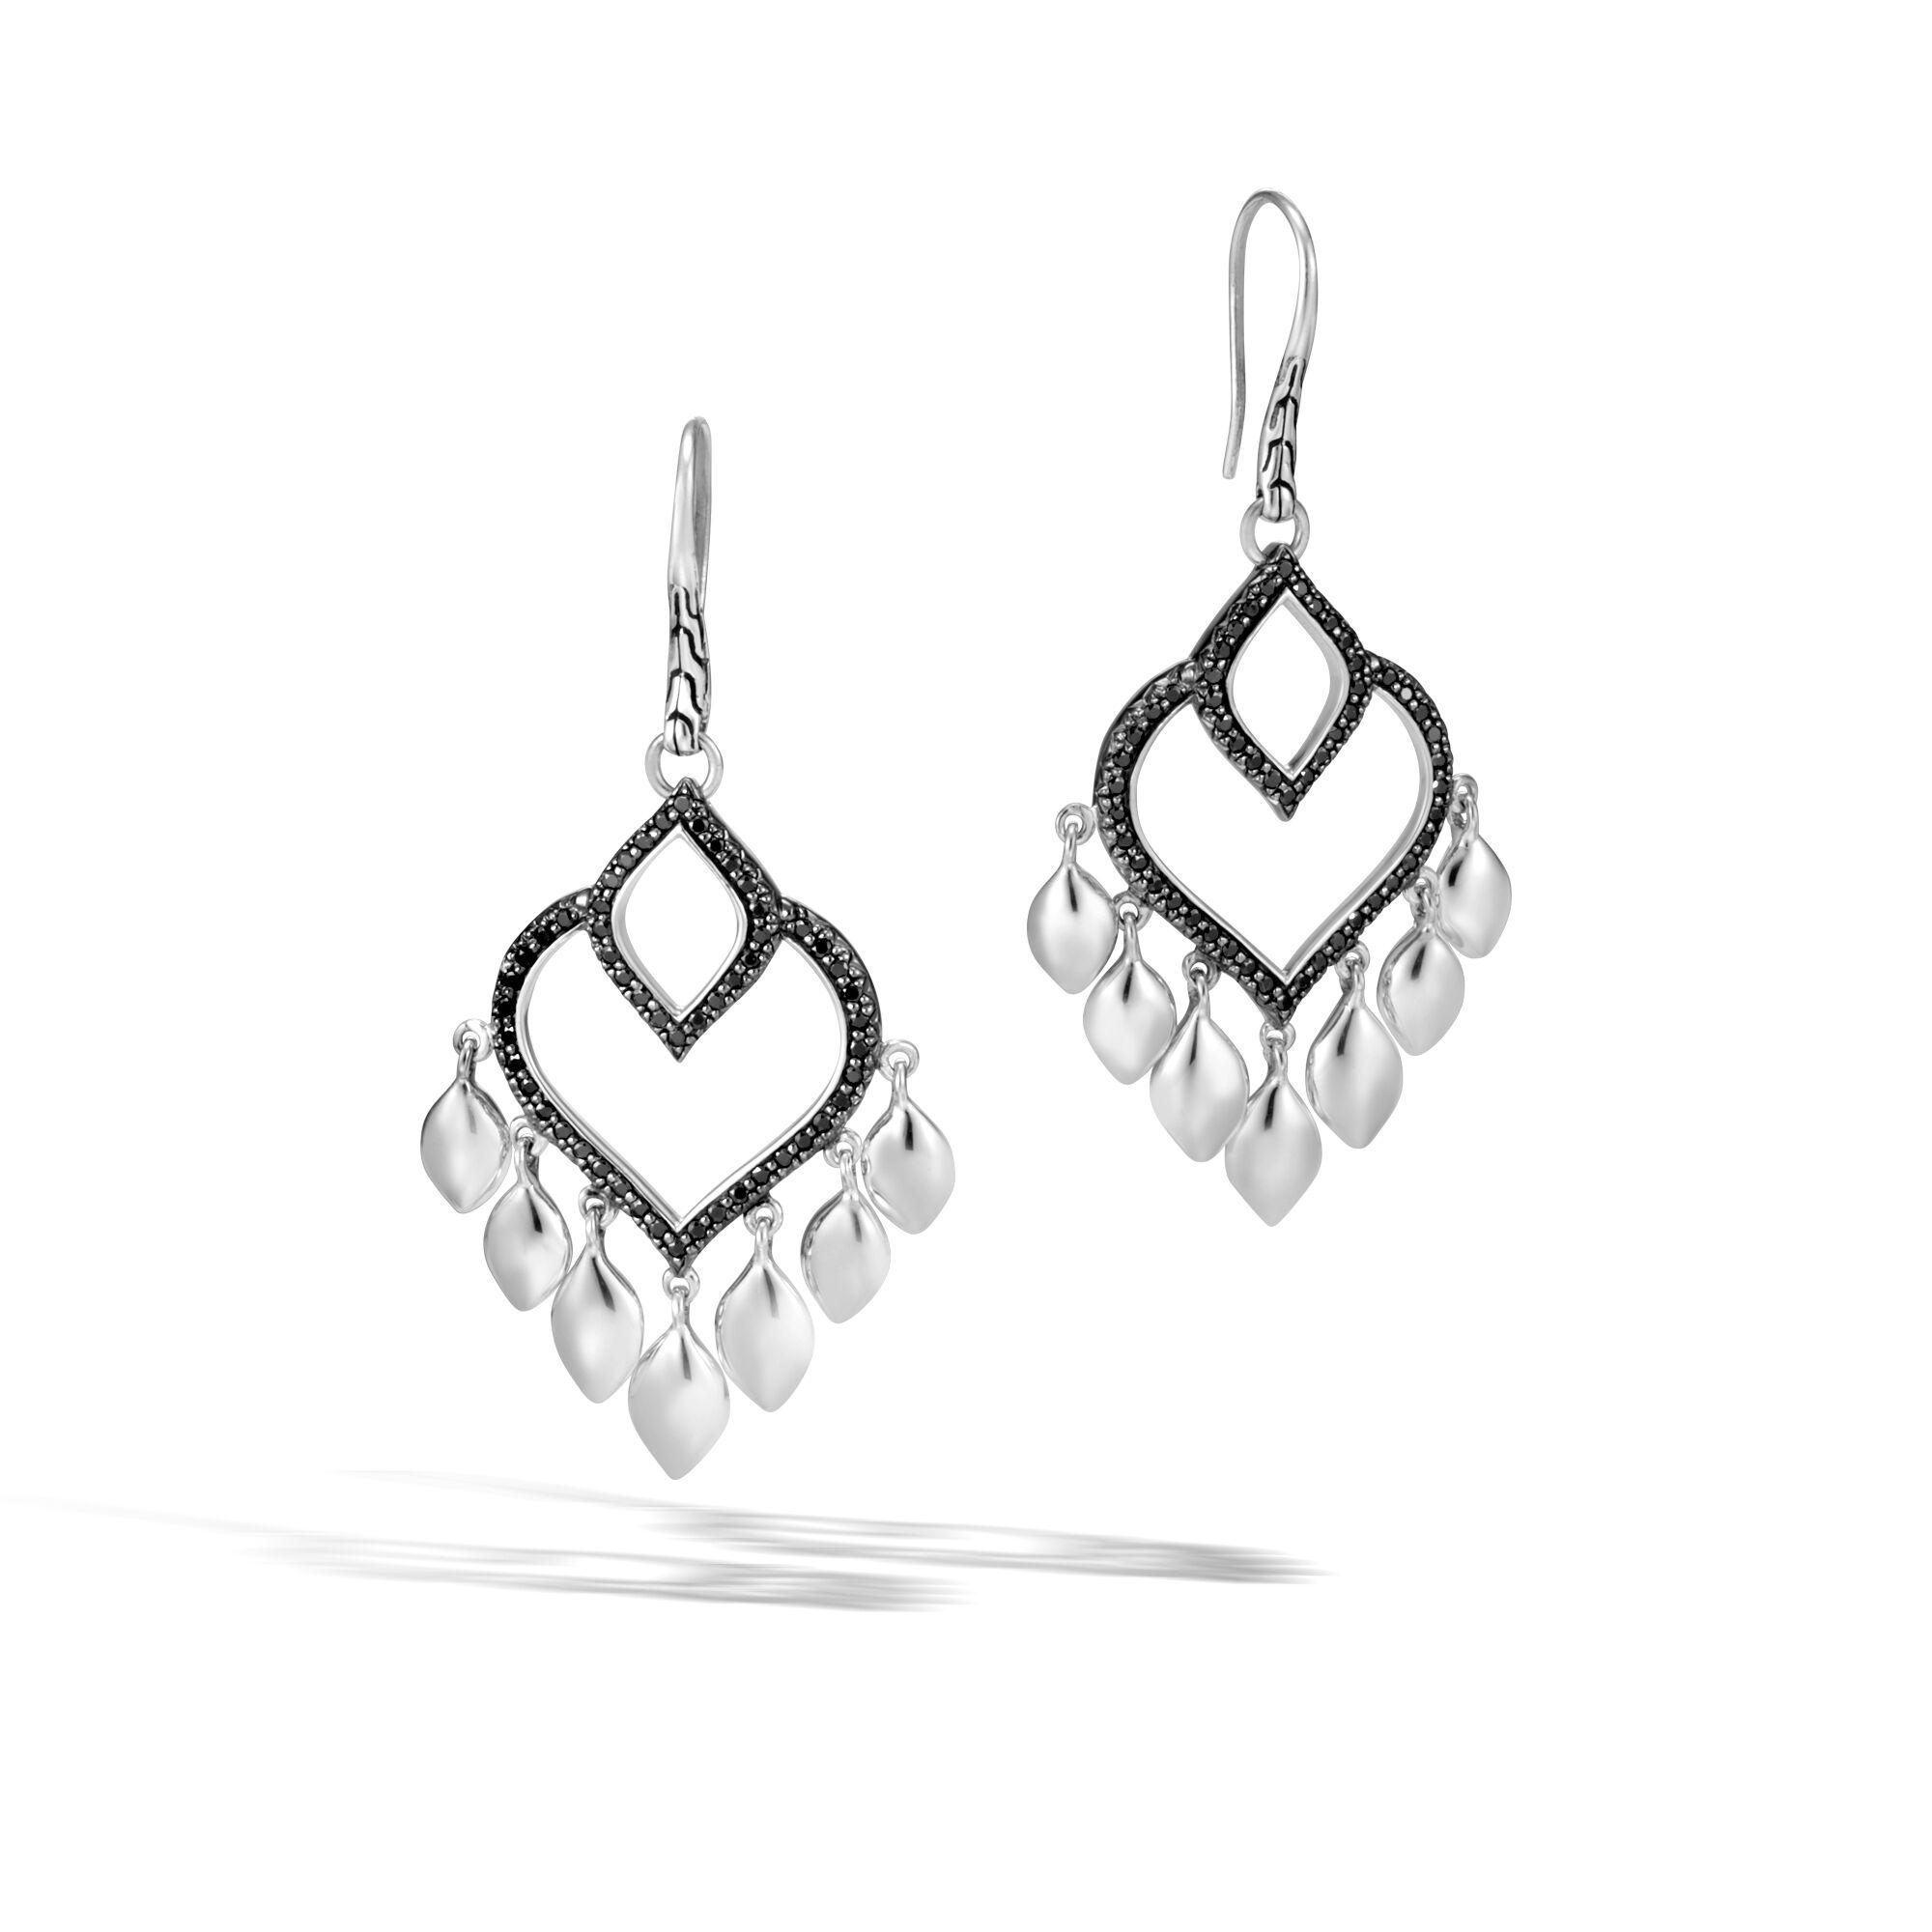 John Hardy Legends Naga Earrings with Diamonds 9hnI9FPm